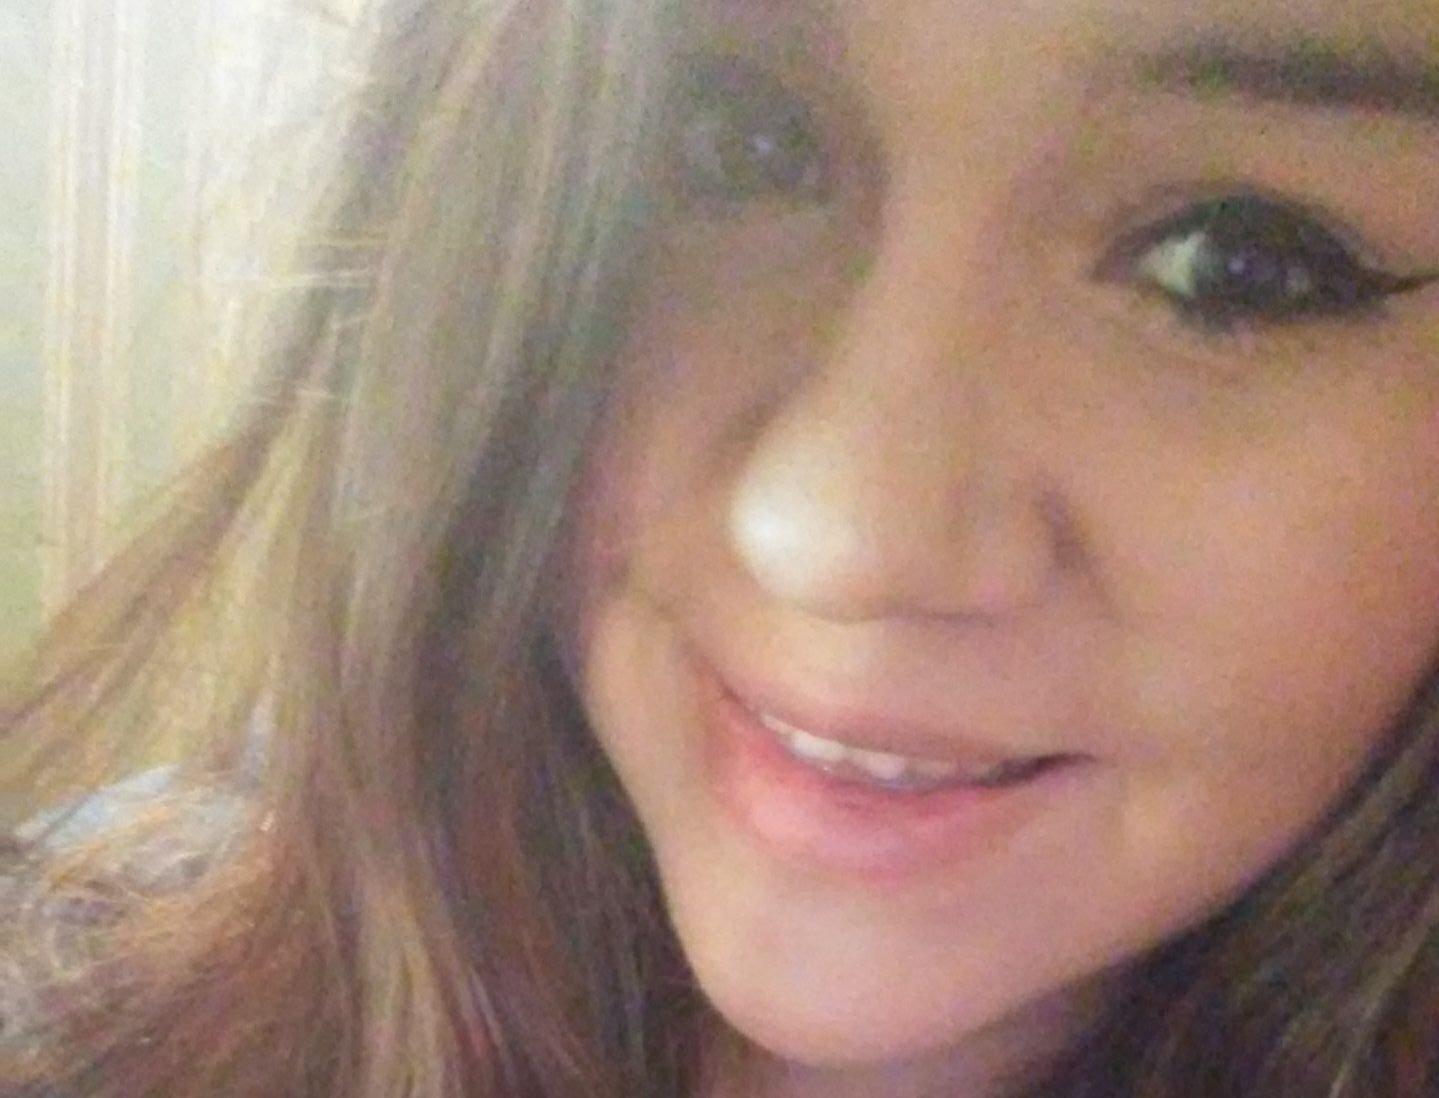 Investigators say 20-year-old Idalis Ramirez was pronounced dead after a T-bone crash Saturday morning. (Facebook: Idalis Ramirez)